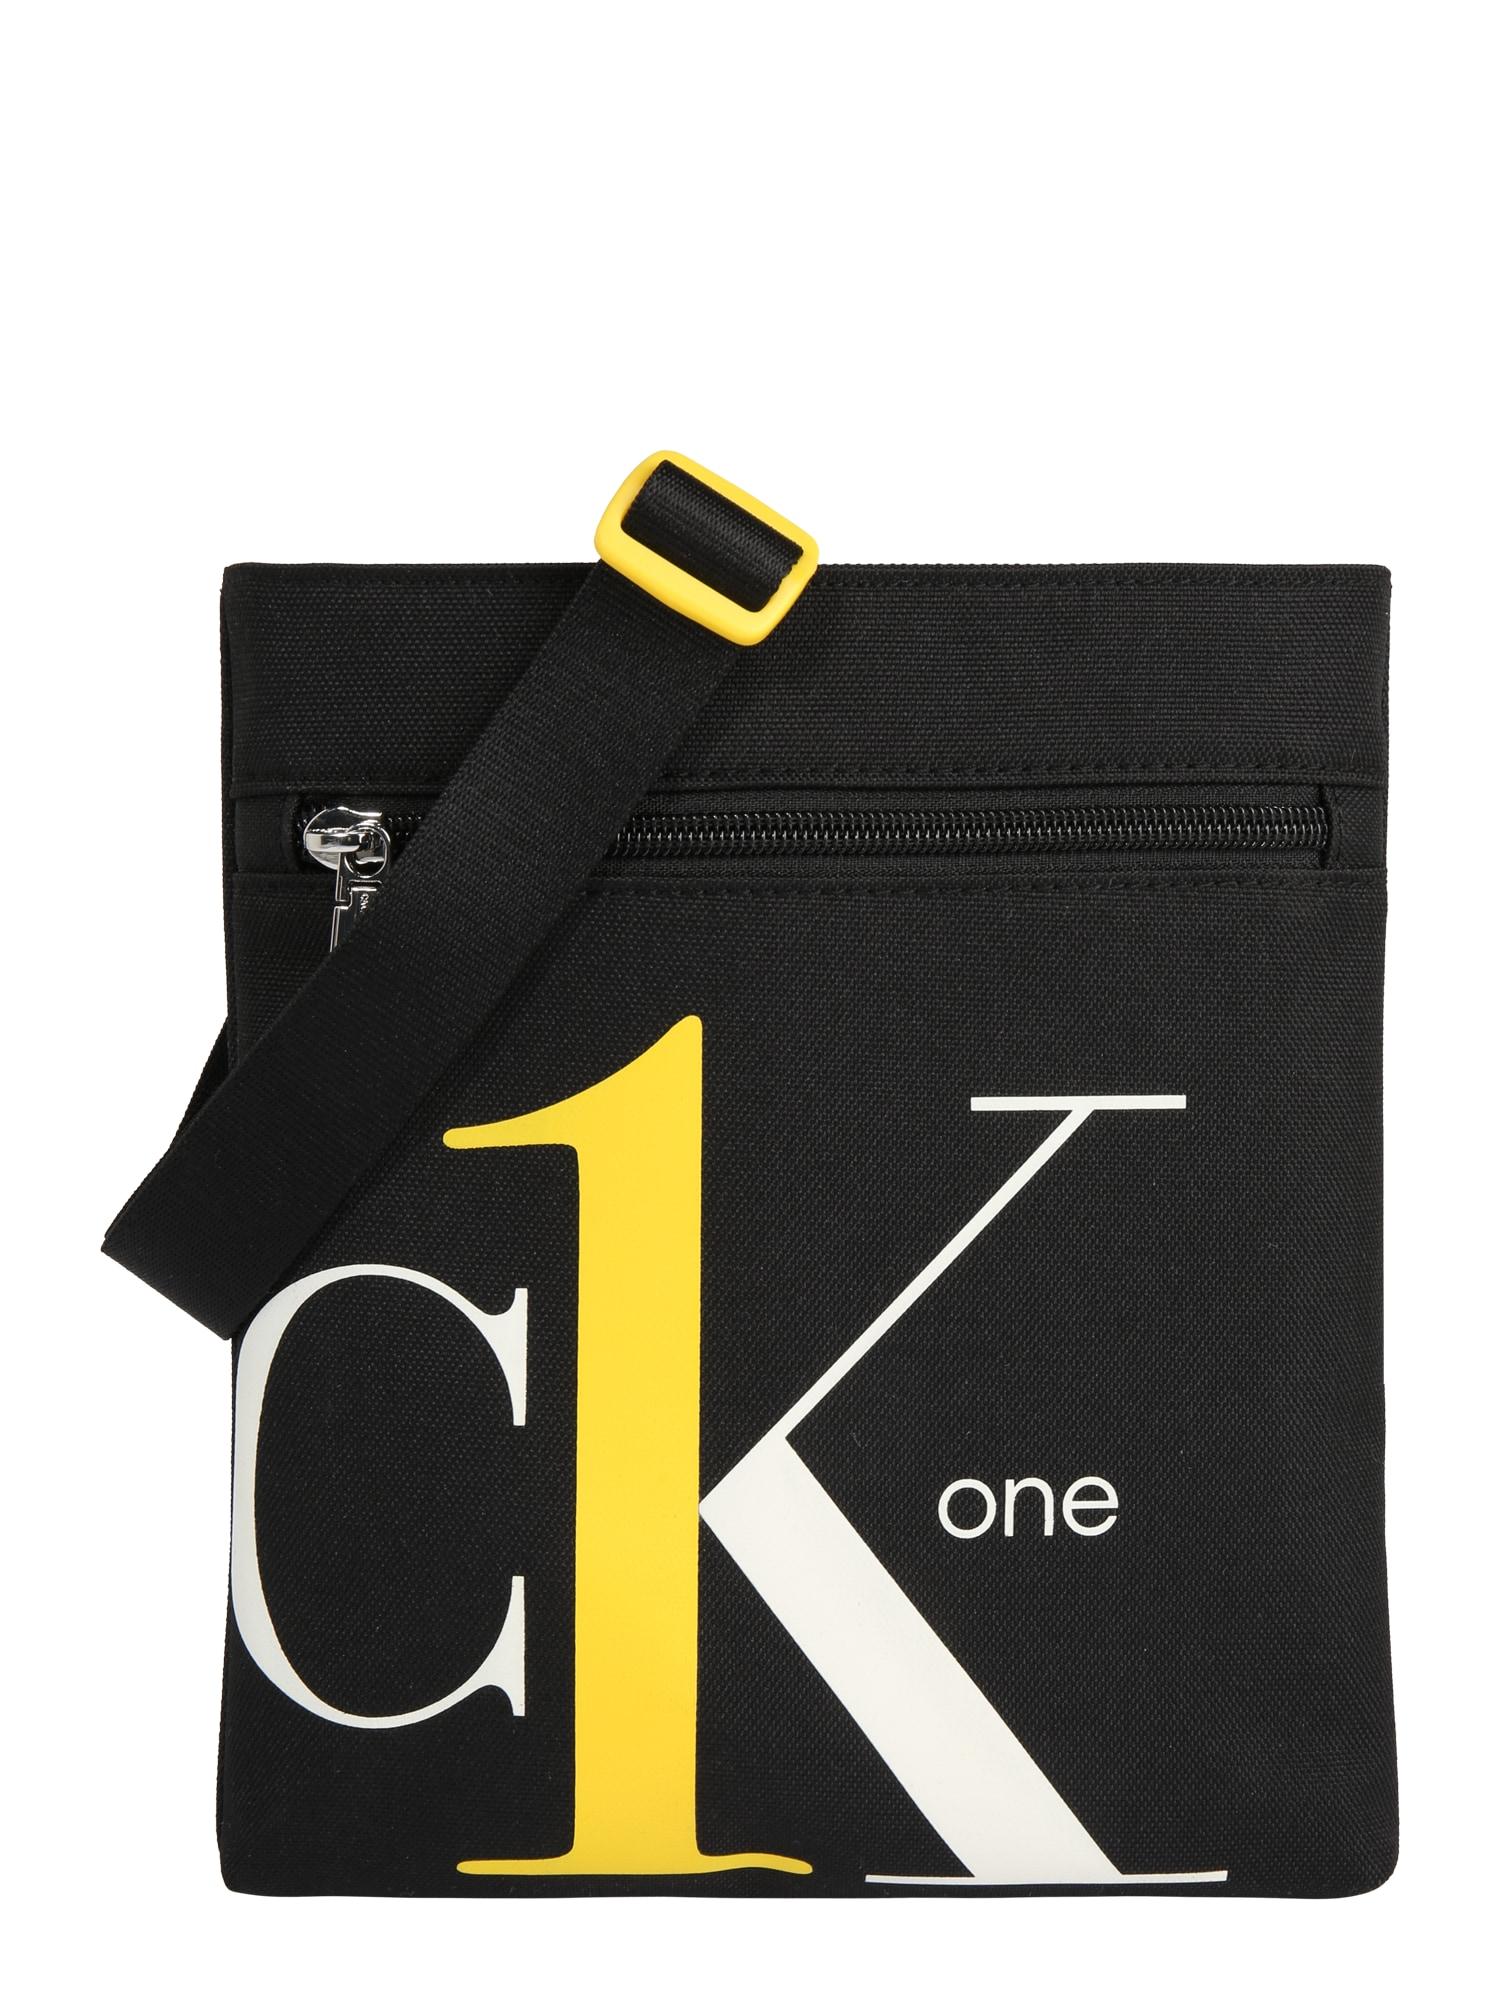 Calvin Klein Jeans Rankinė su ilgu dirželiu 'CK1 MICRO FLATPACK' balta / juoda / geltona